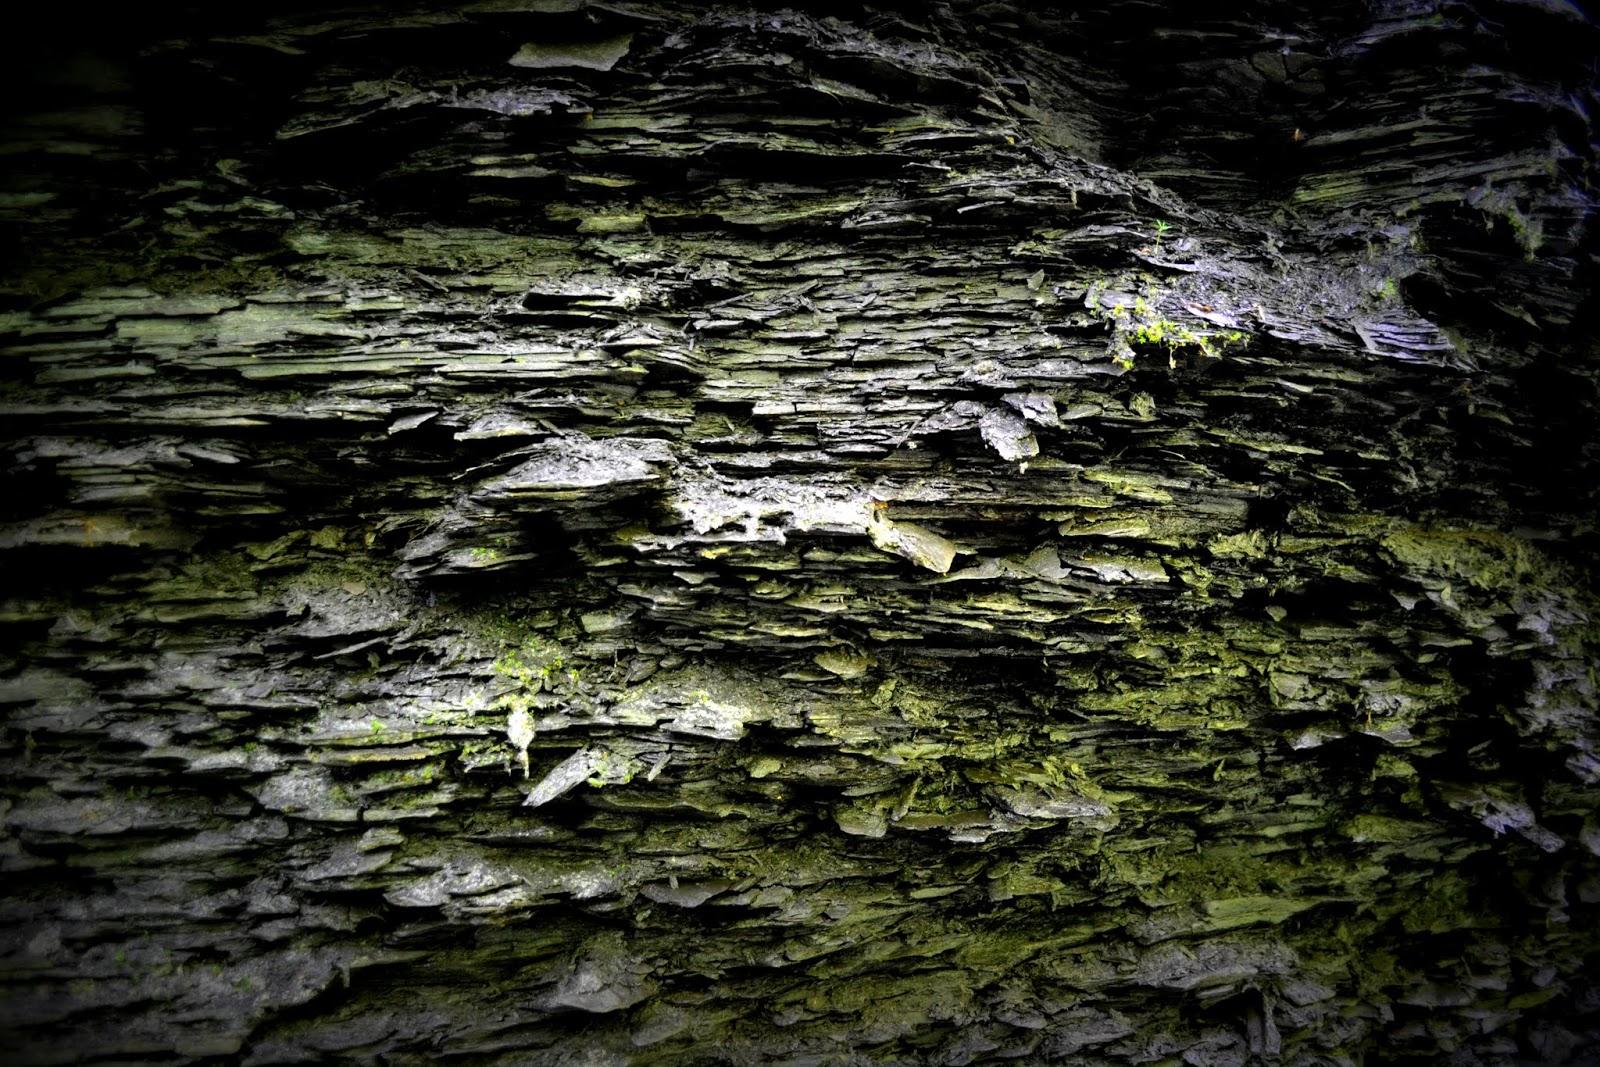 Парк Филмор Глен, штат Нью-Йорк (Fillmore Glen State Park, NY)